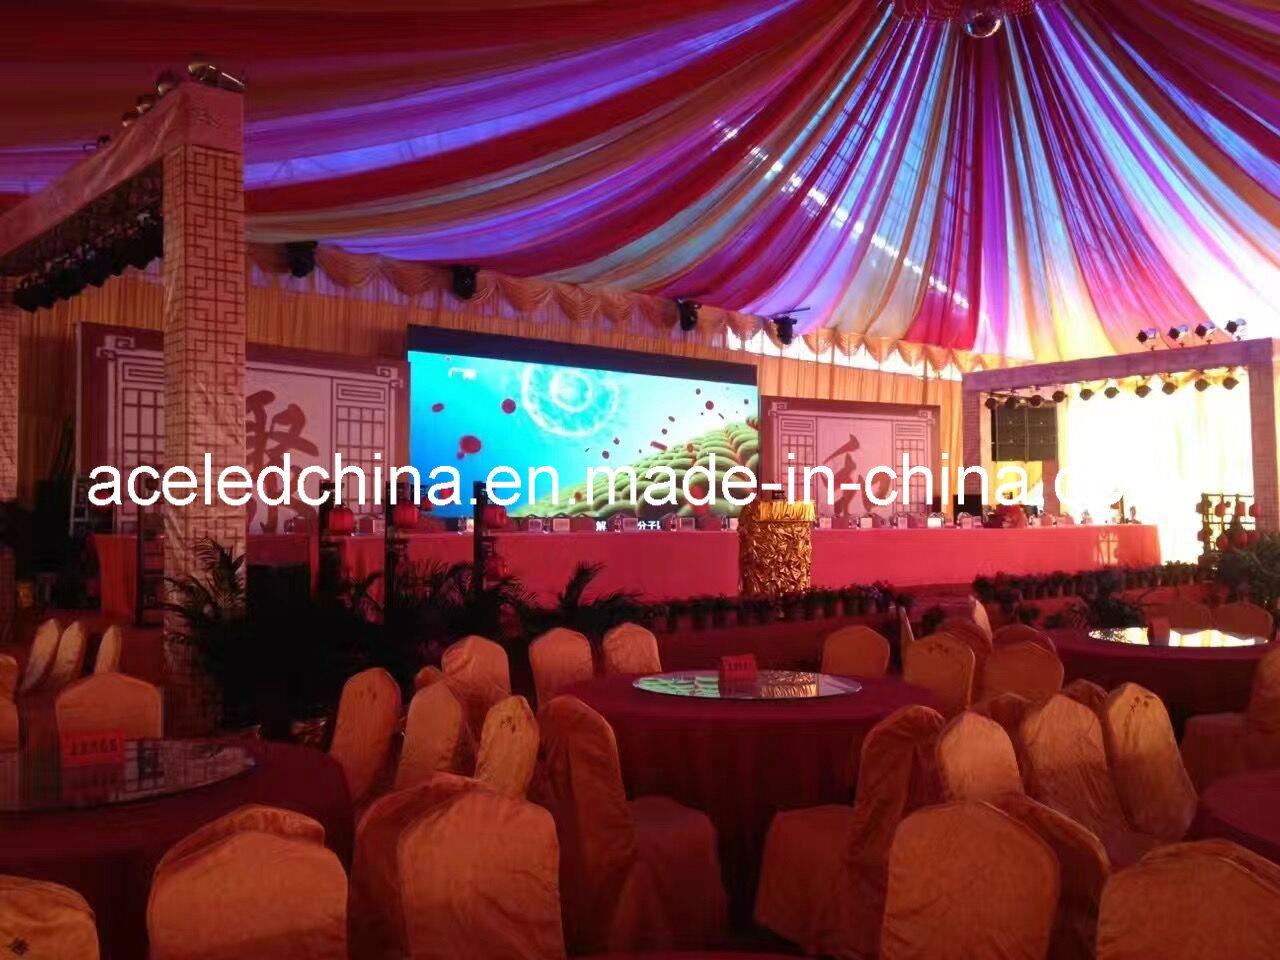 P5 Indoor Advertising Media Lighting Vision Big LED Display